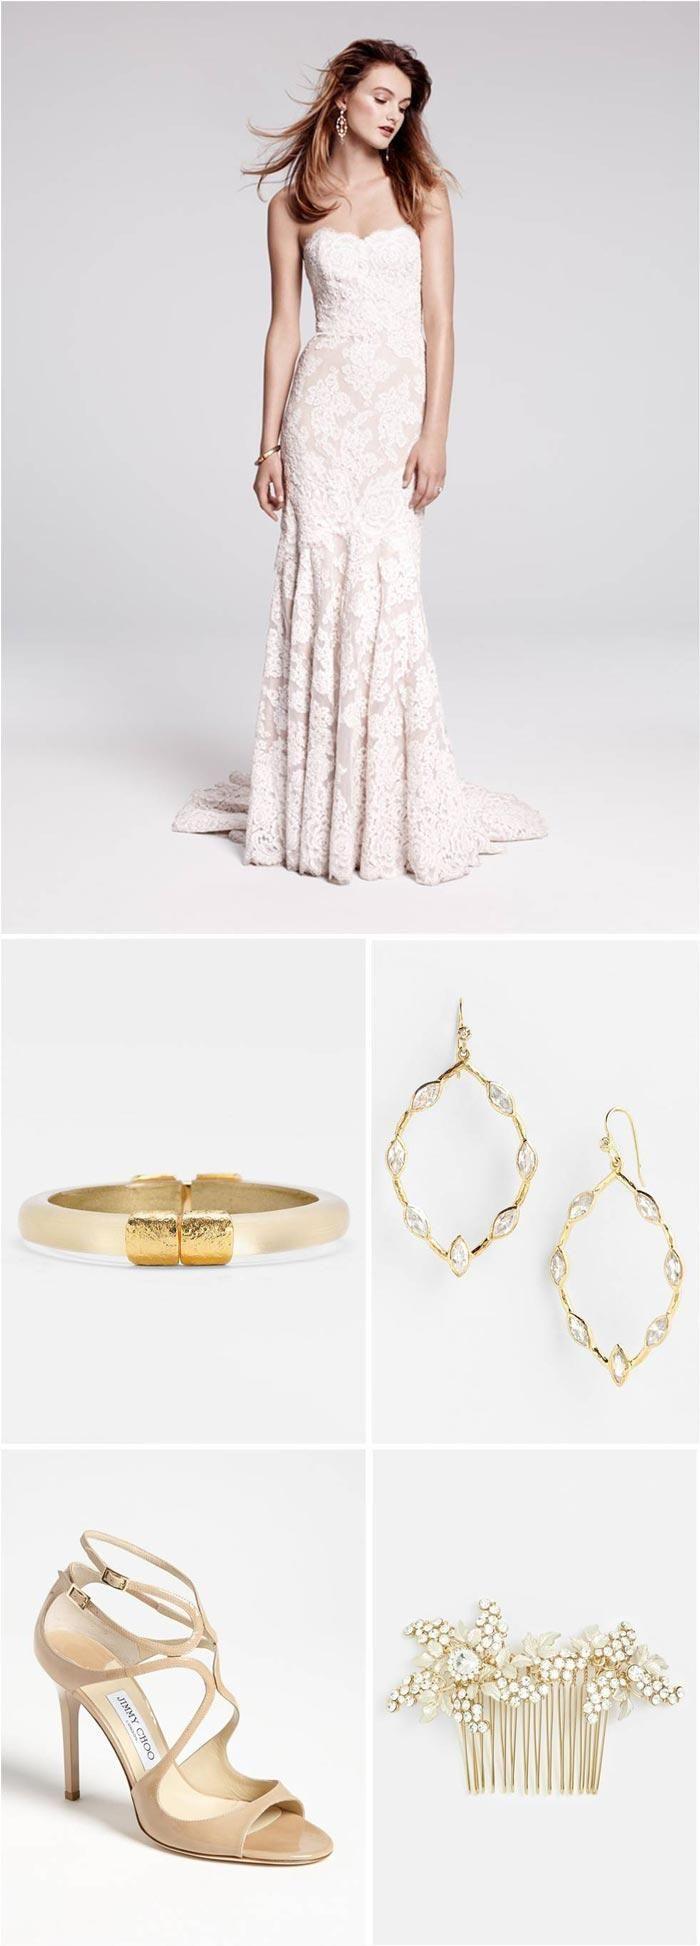 best wedding images on pinterest cute dresses dress skirt and